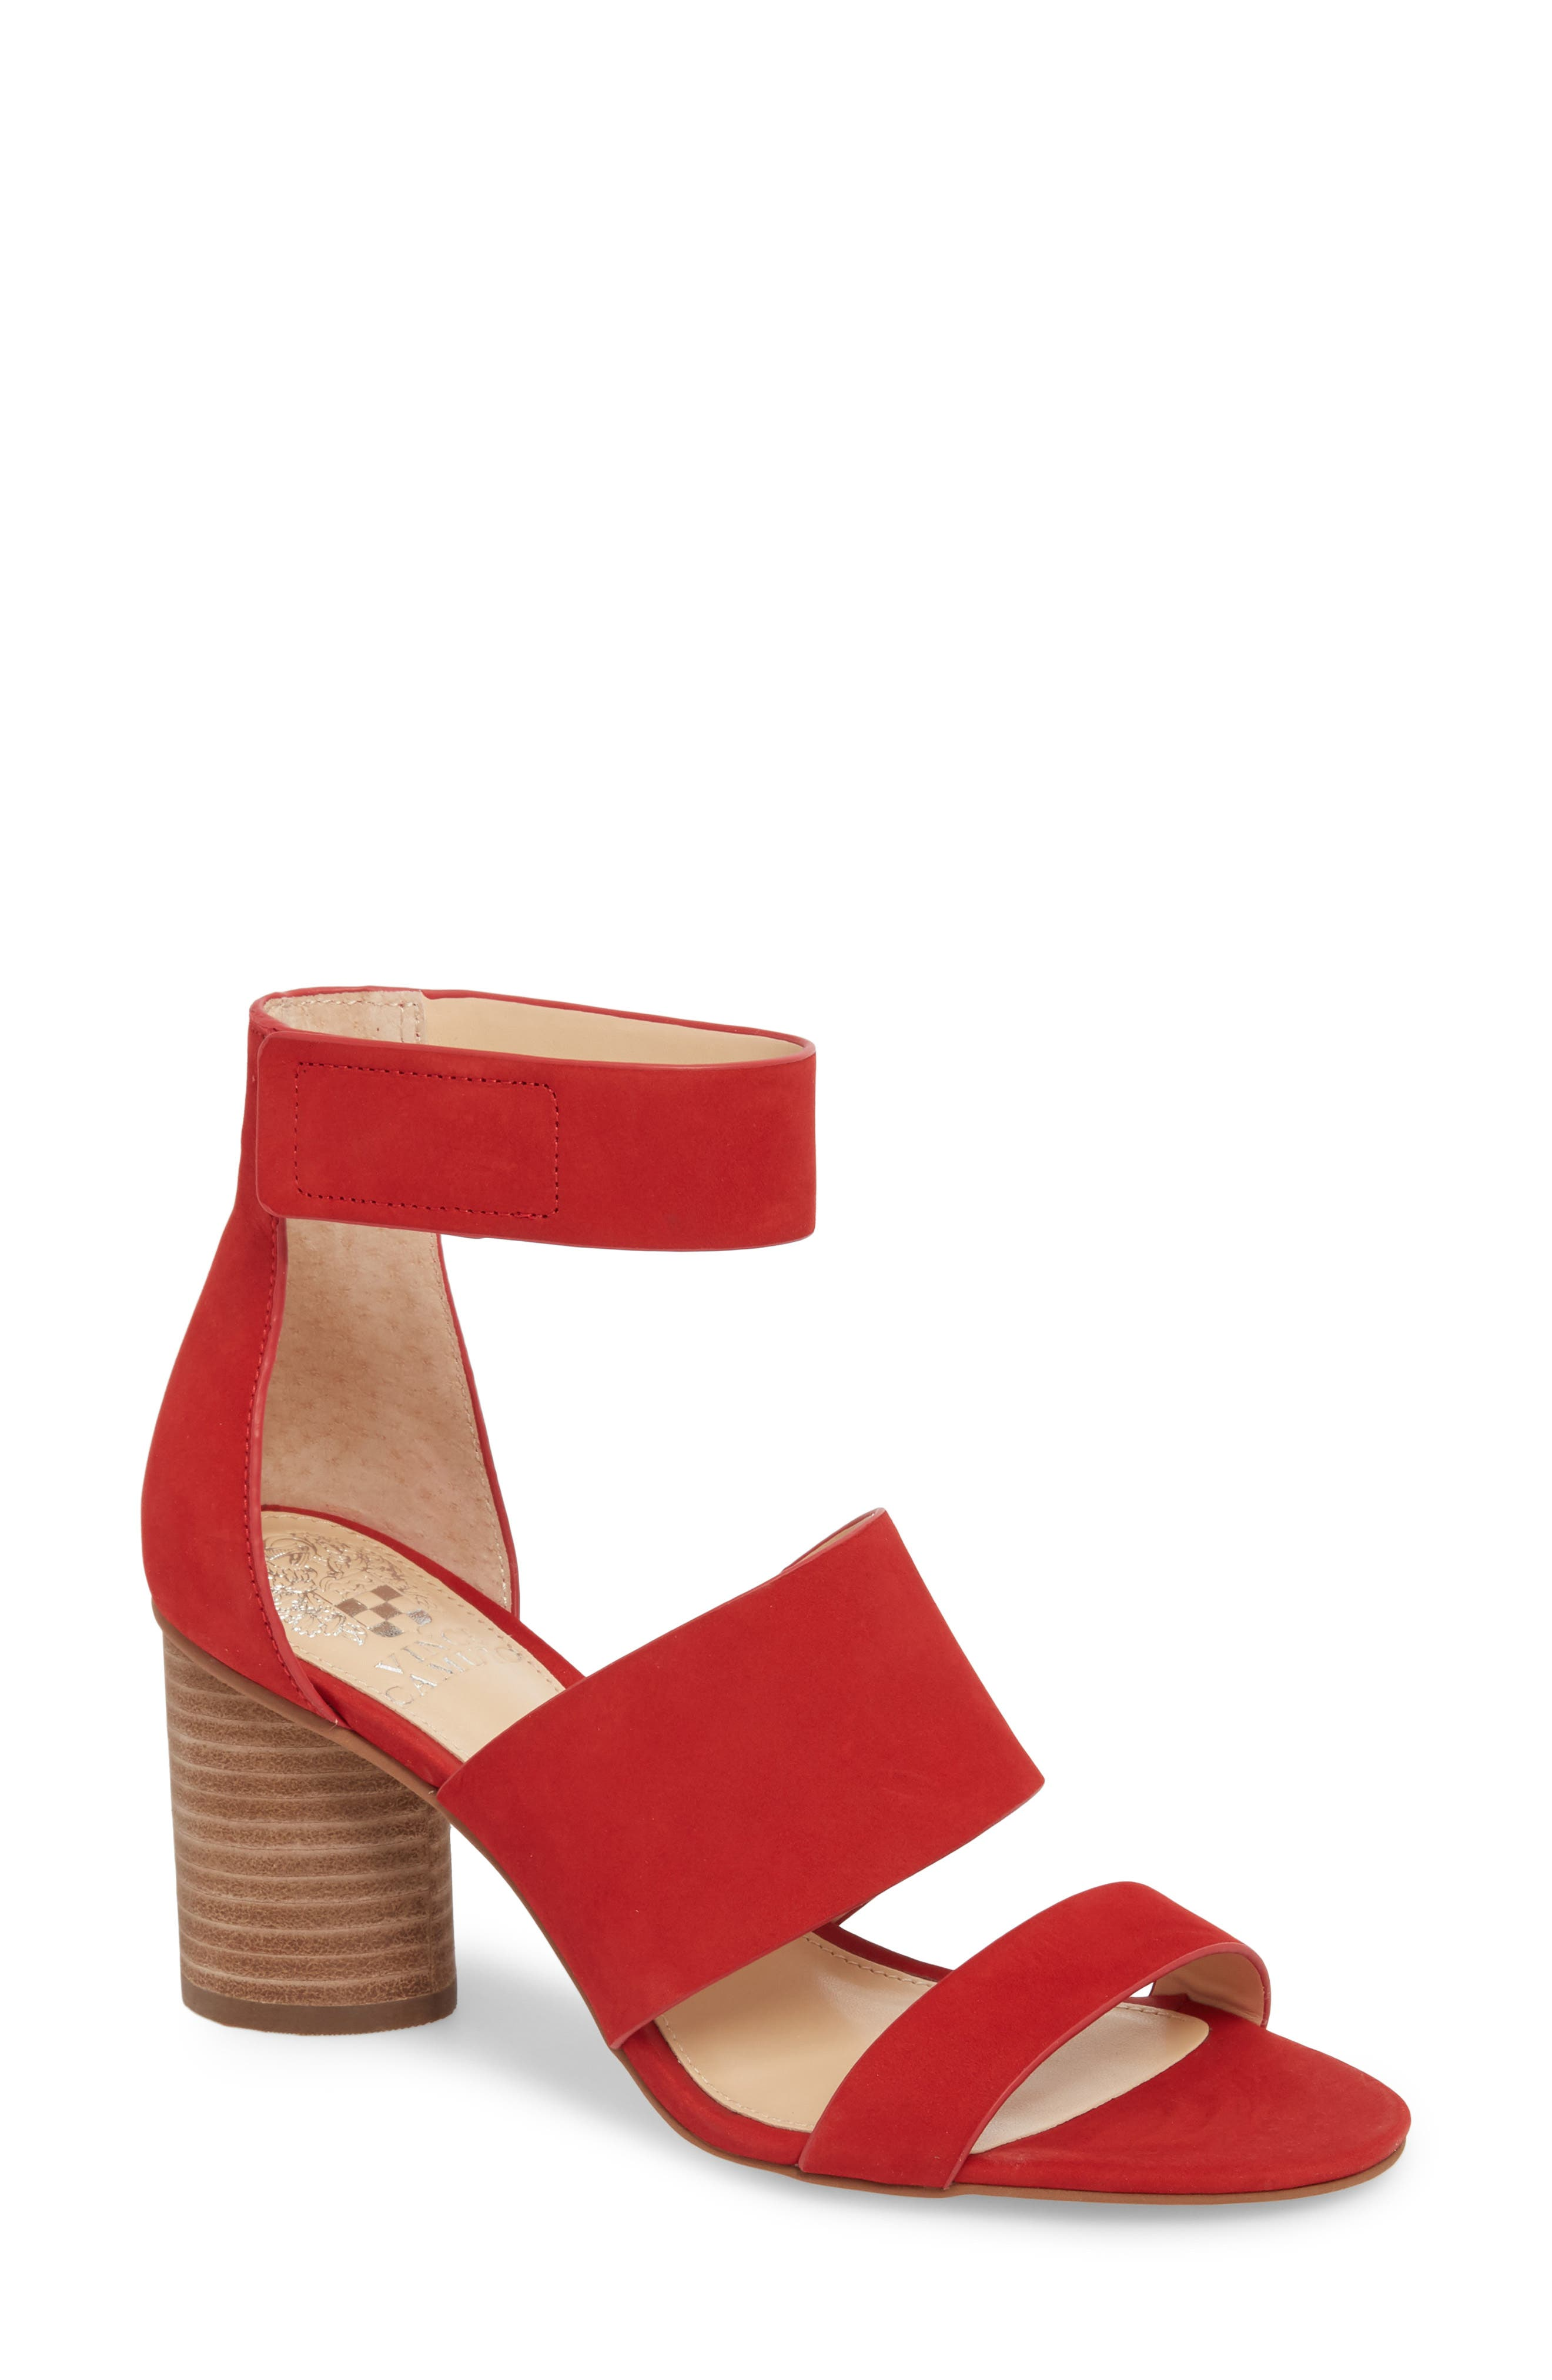 Junette Sandal,                             Main thumbnail 1, color,                             Cherry Red Leather